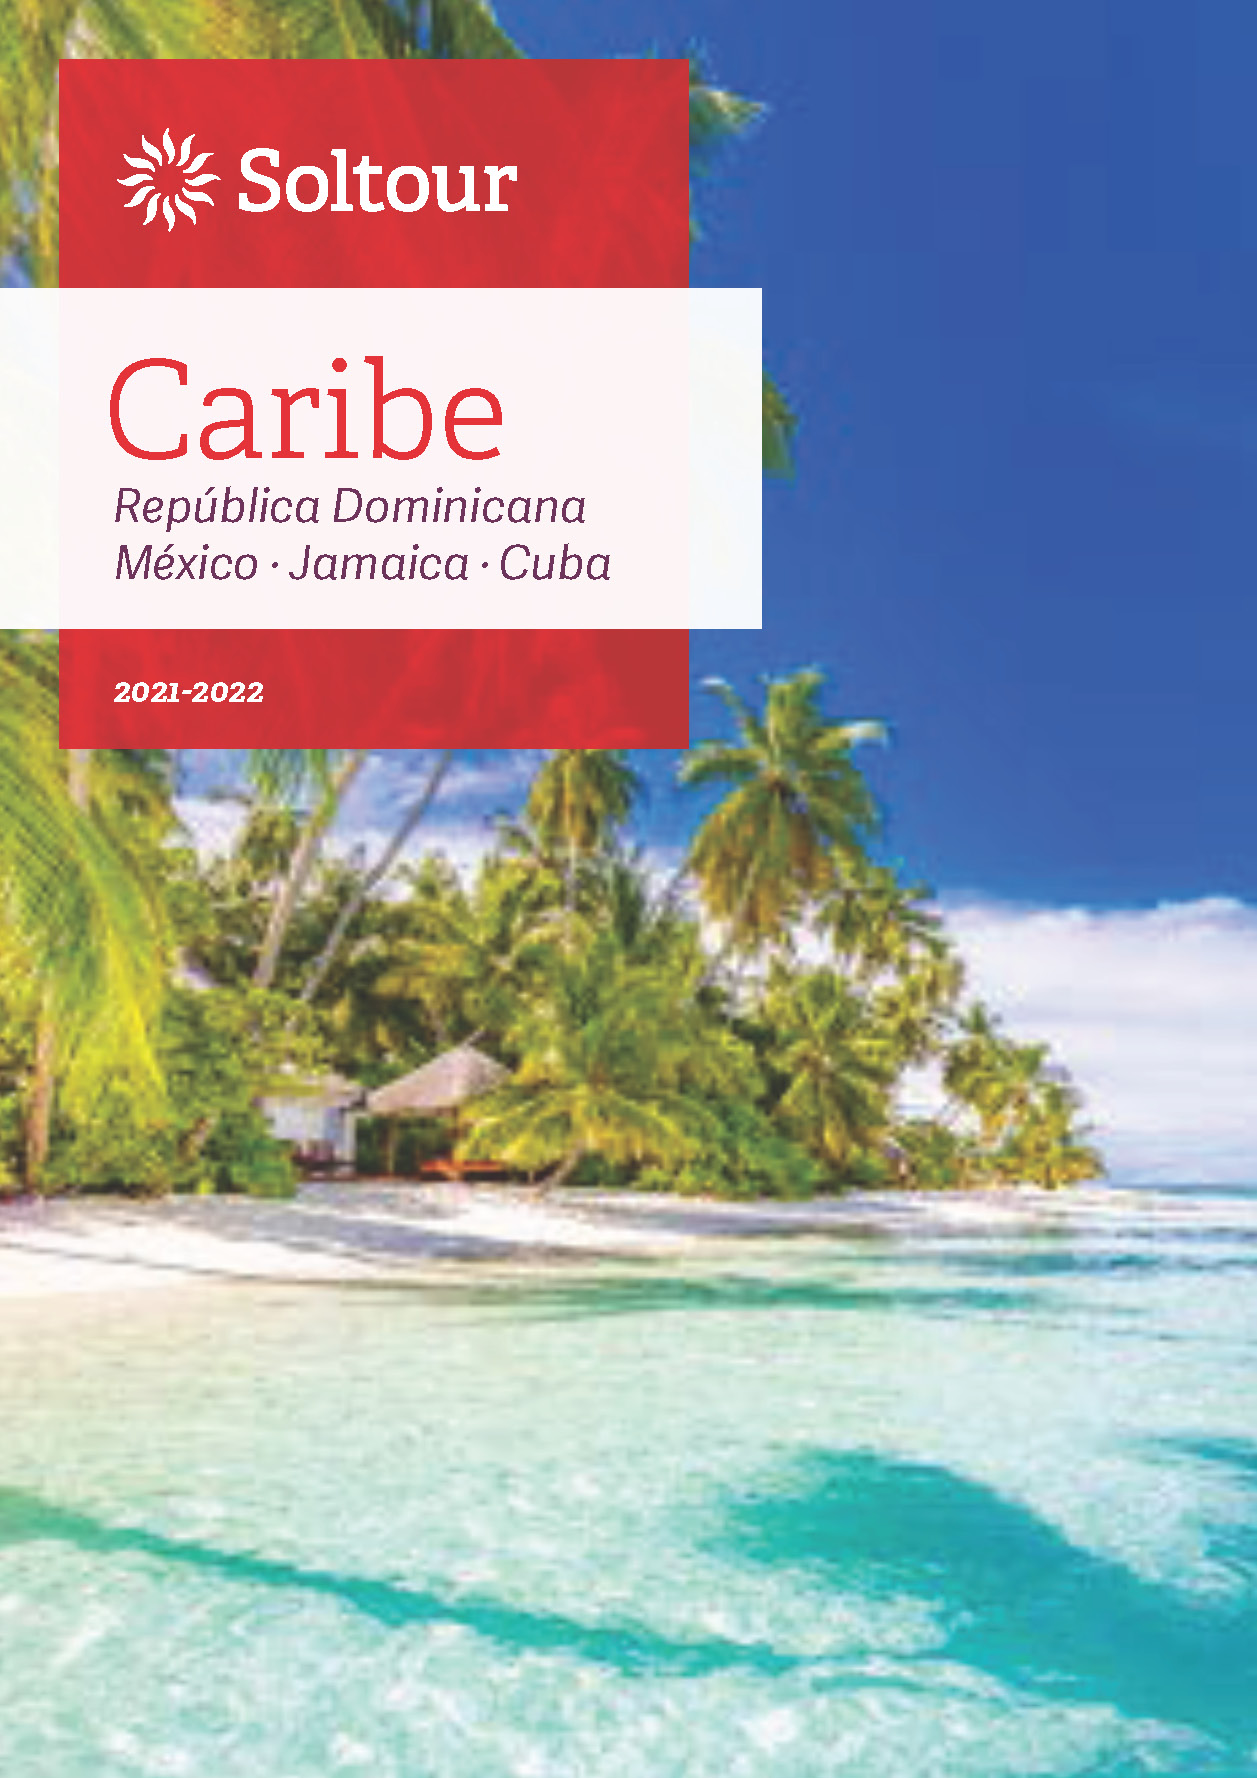 Catalogo Soltour Caribe 2021-2022